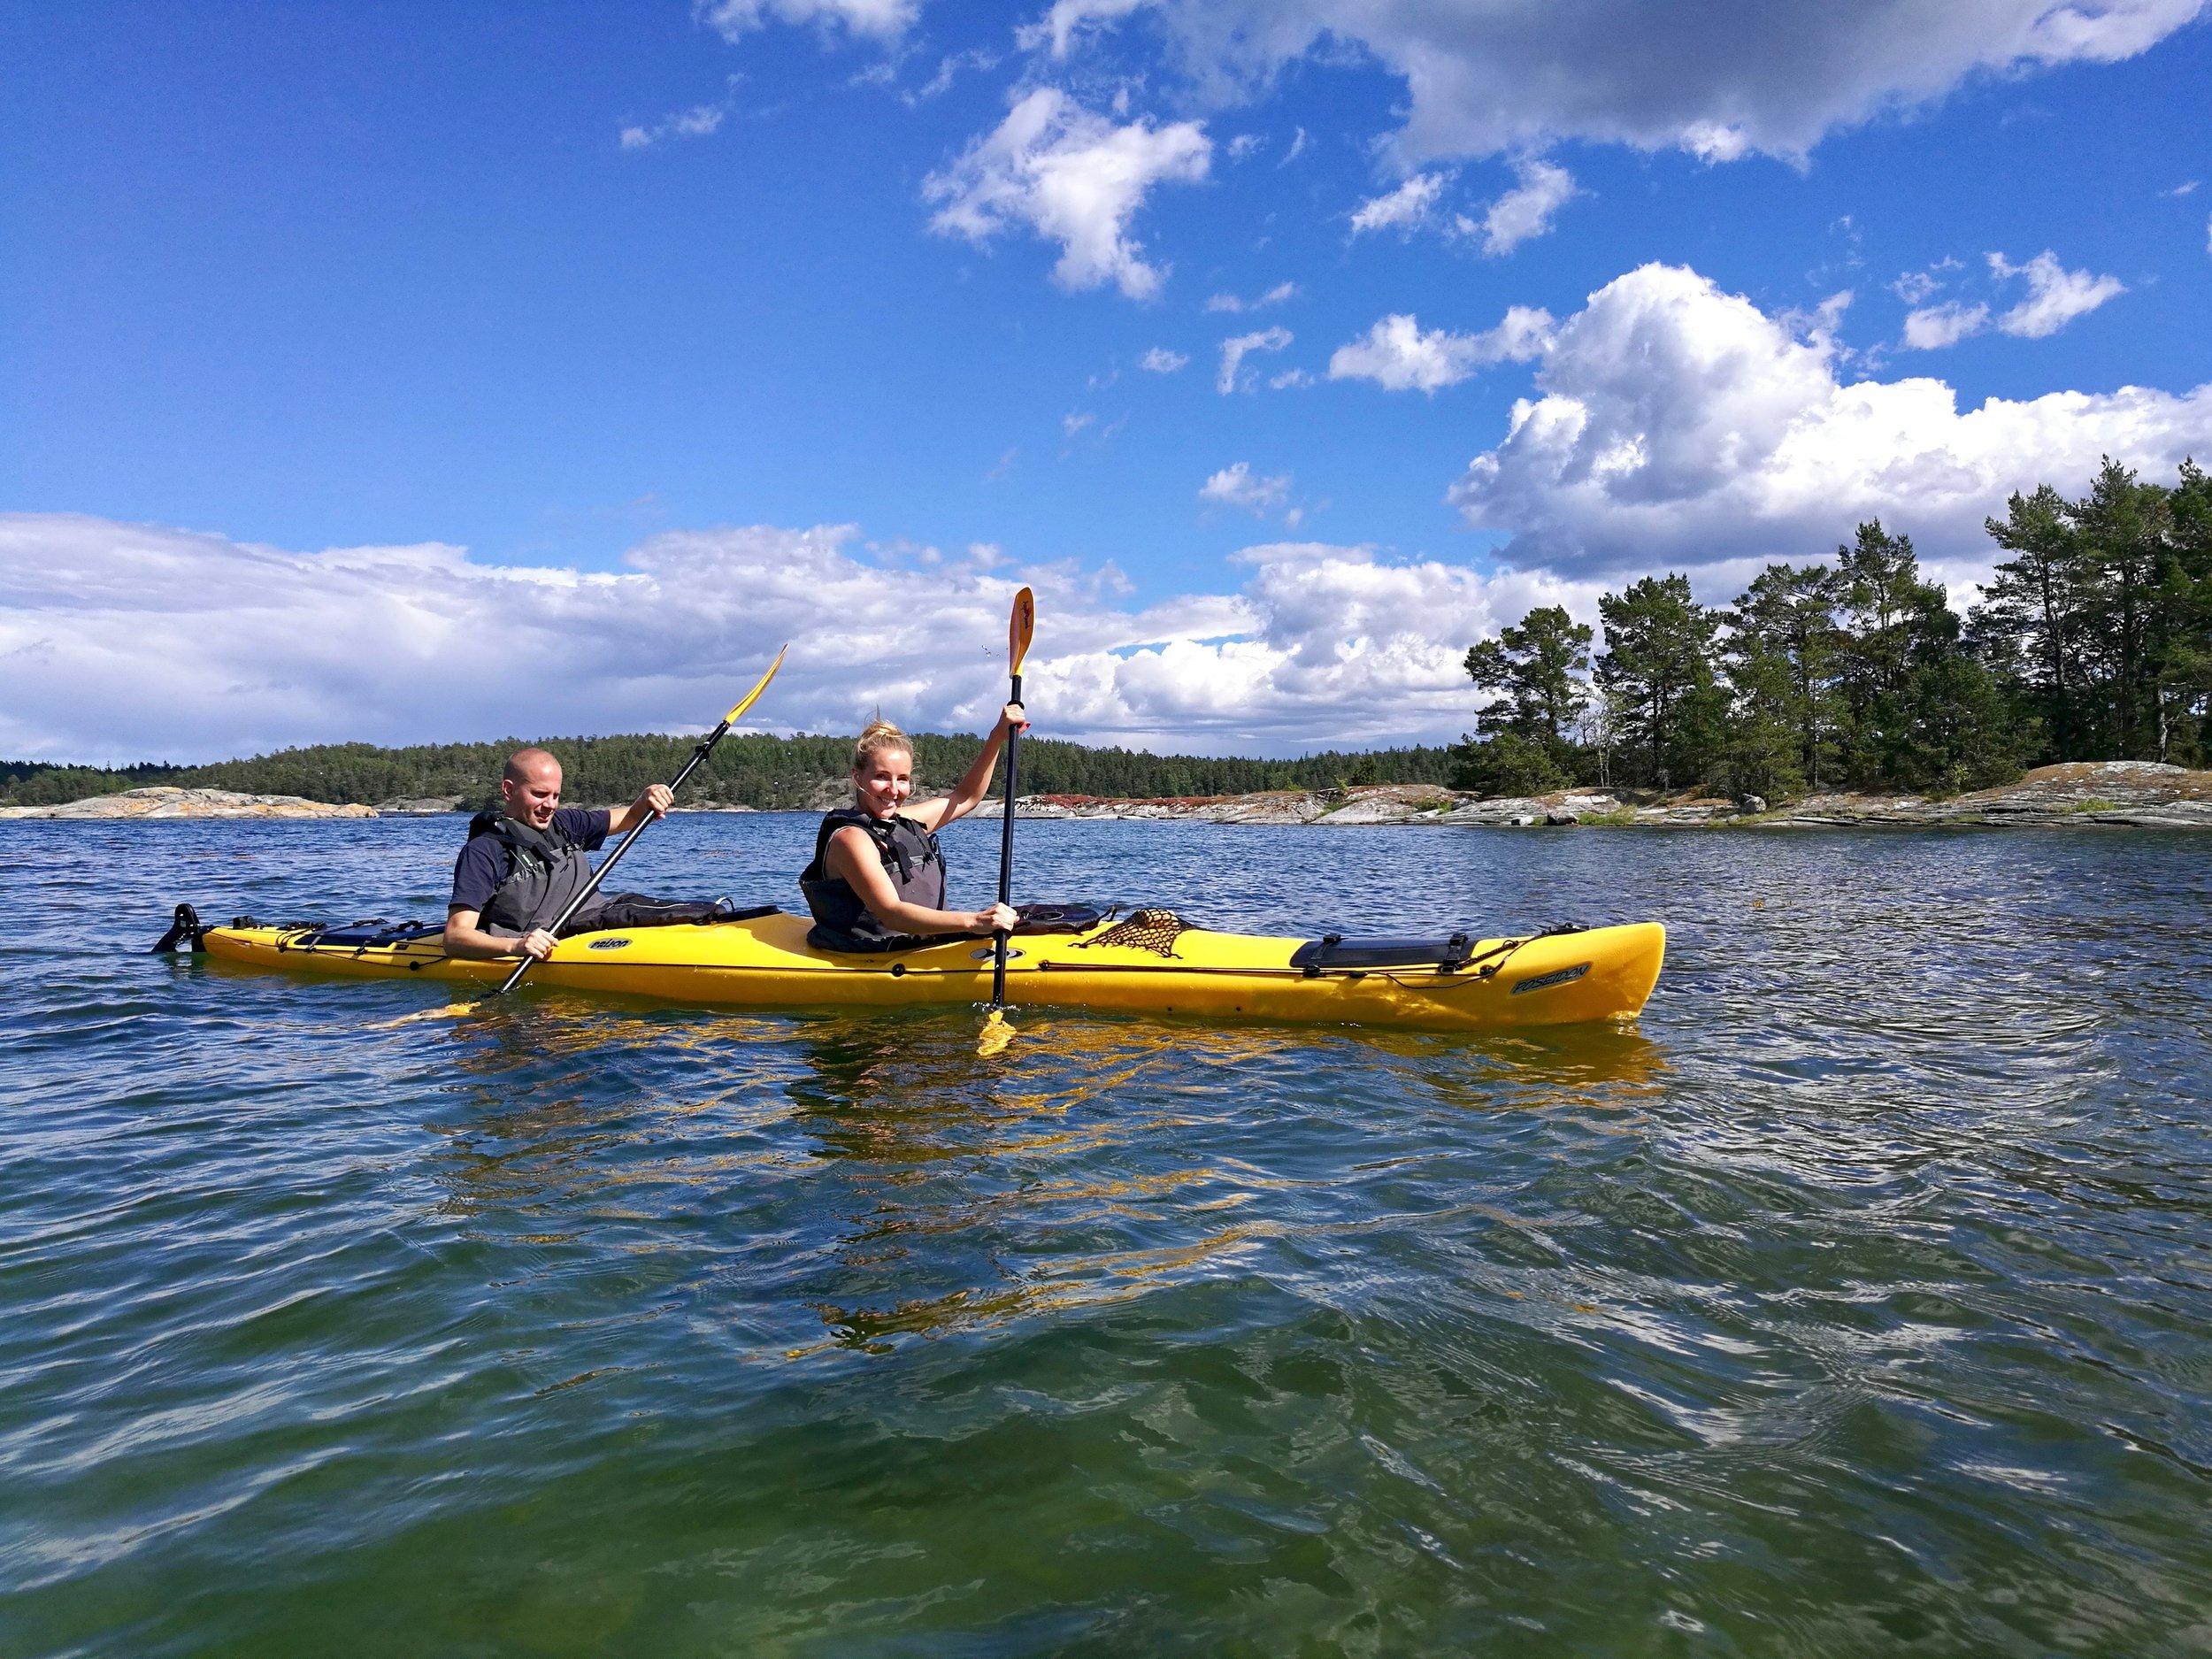 Stockholm Archipelago Kayaking 1 day